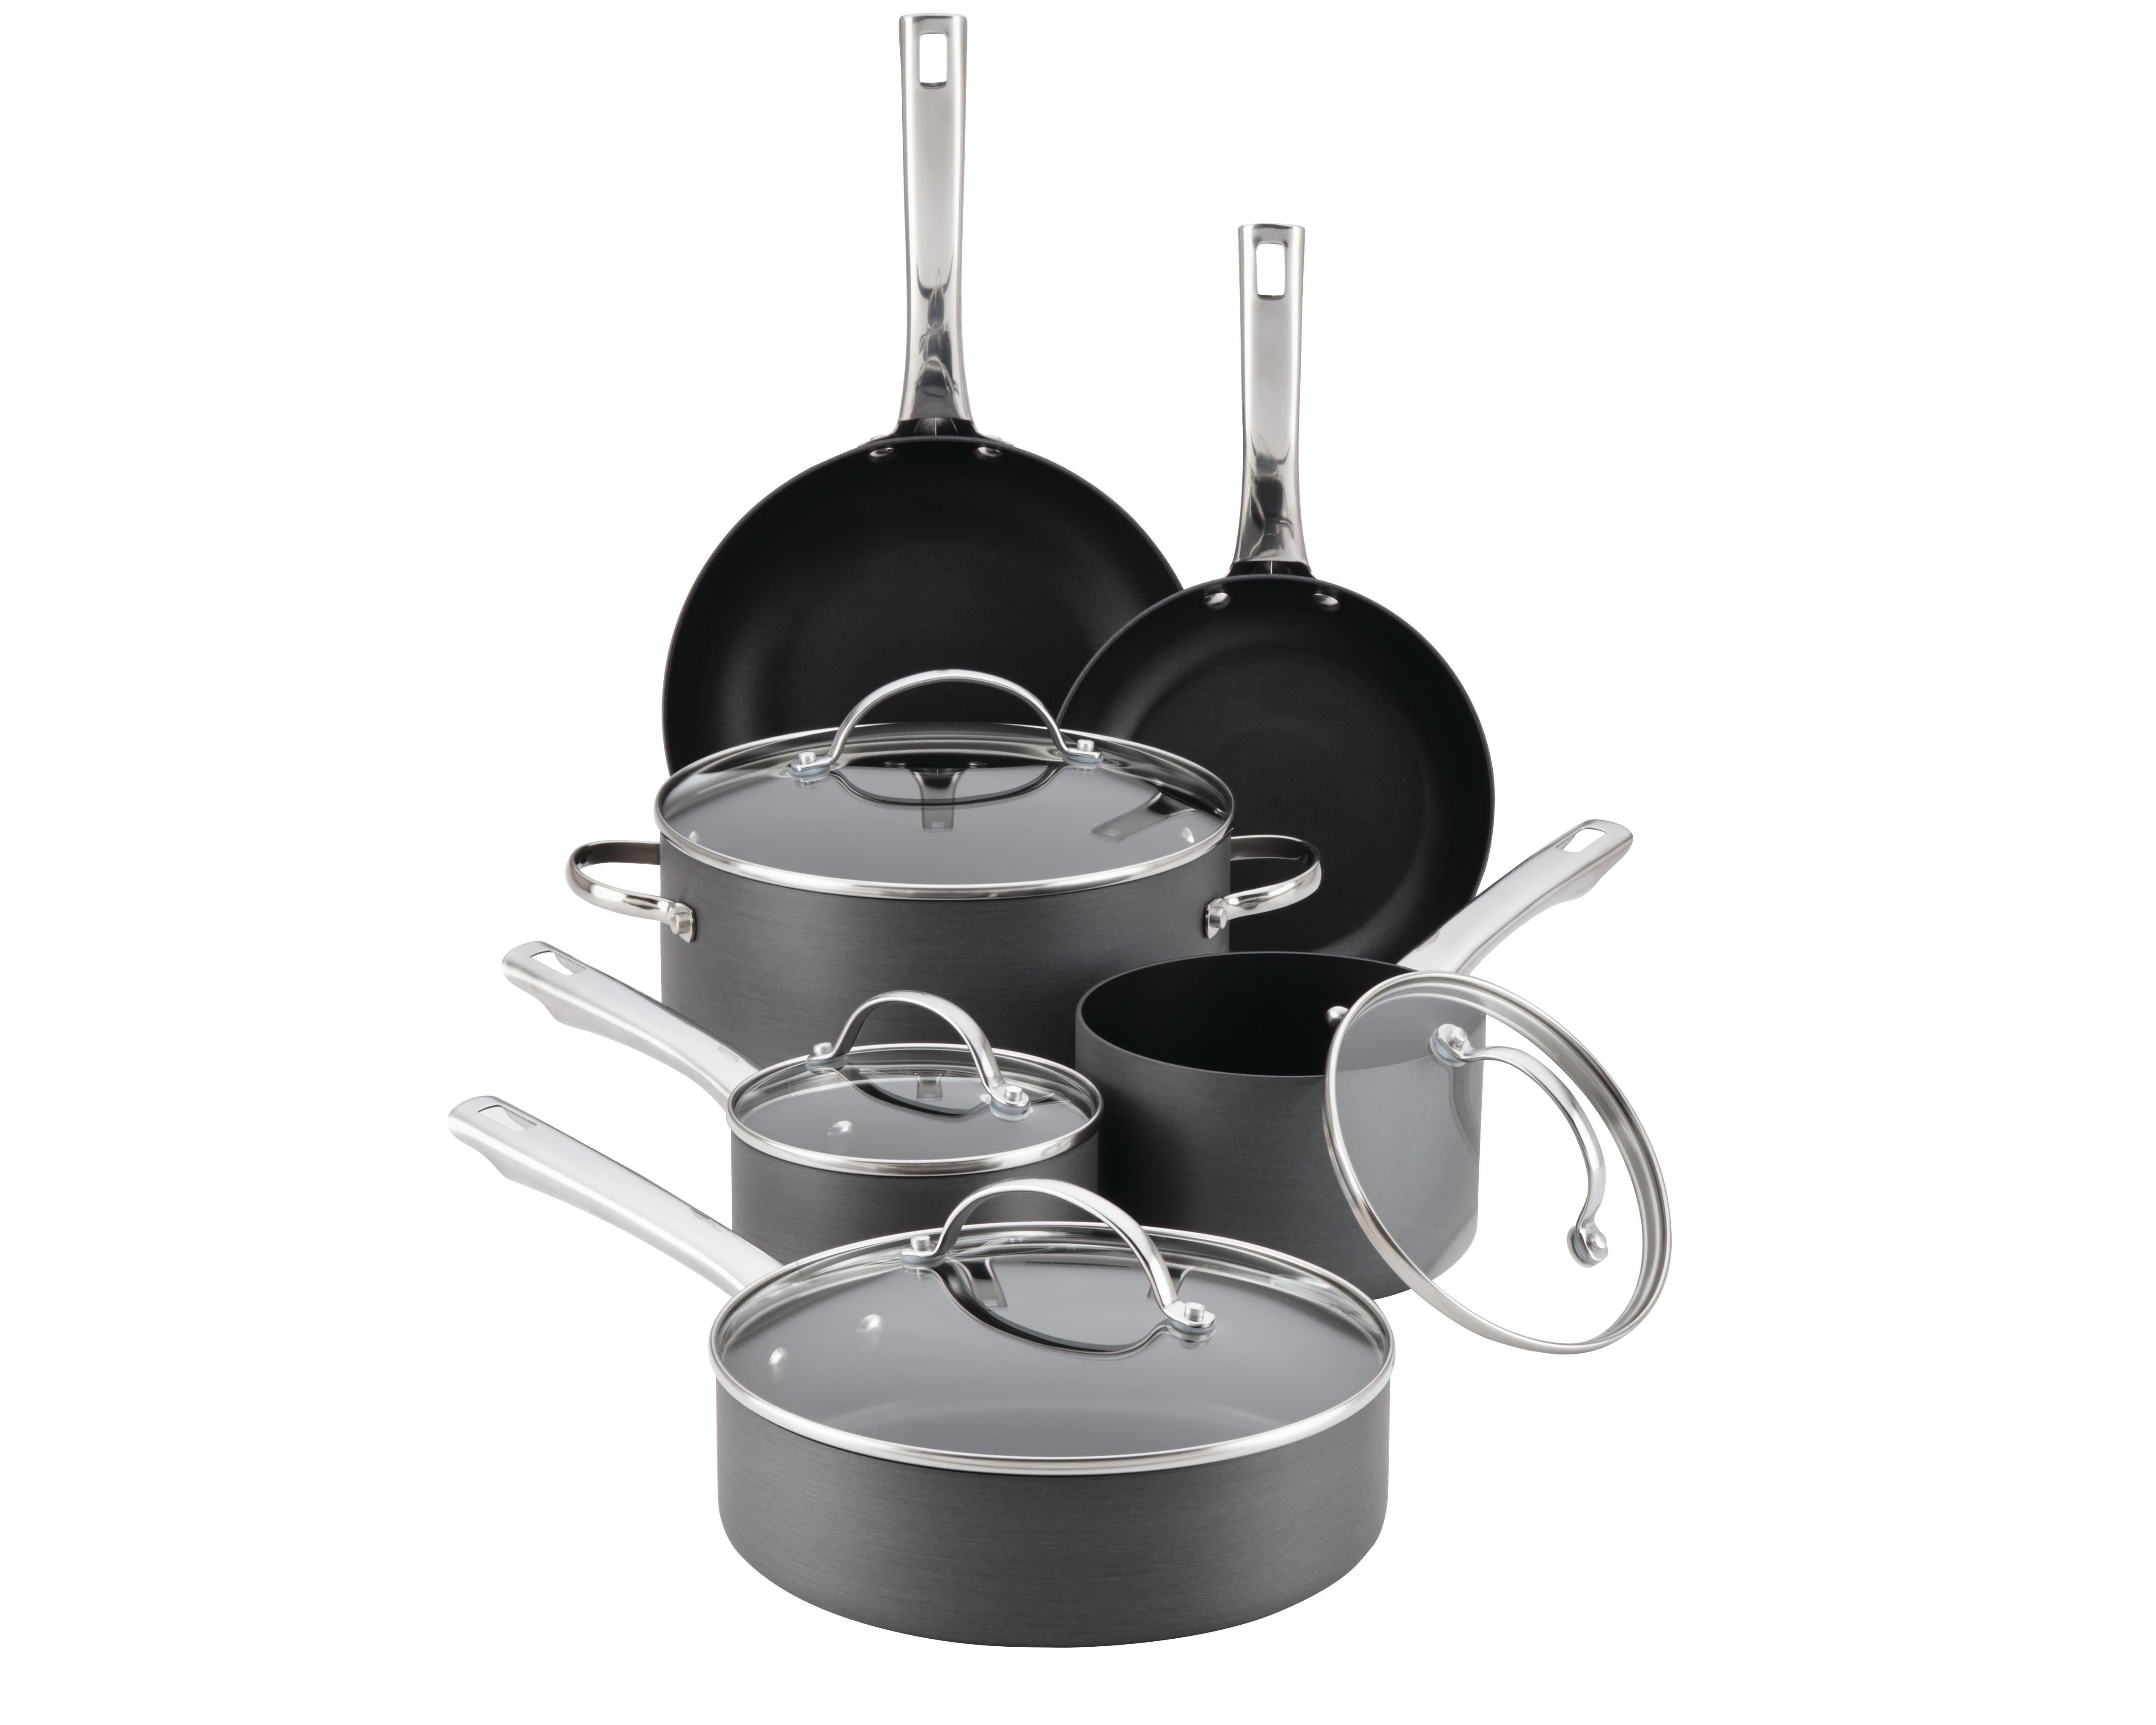 Farberware Nonstick Cookware Set | eBay